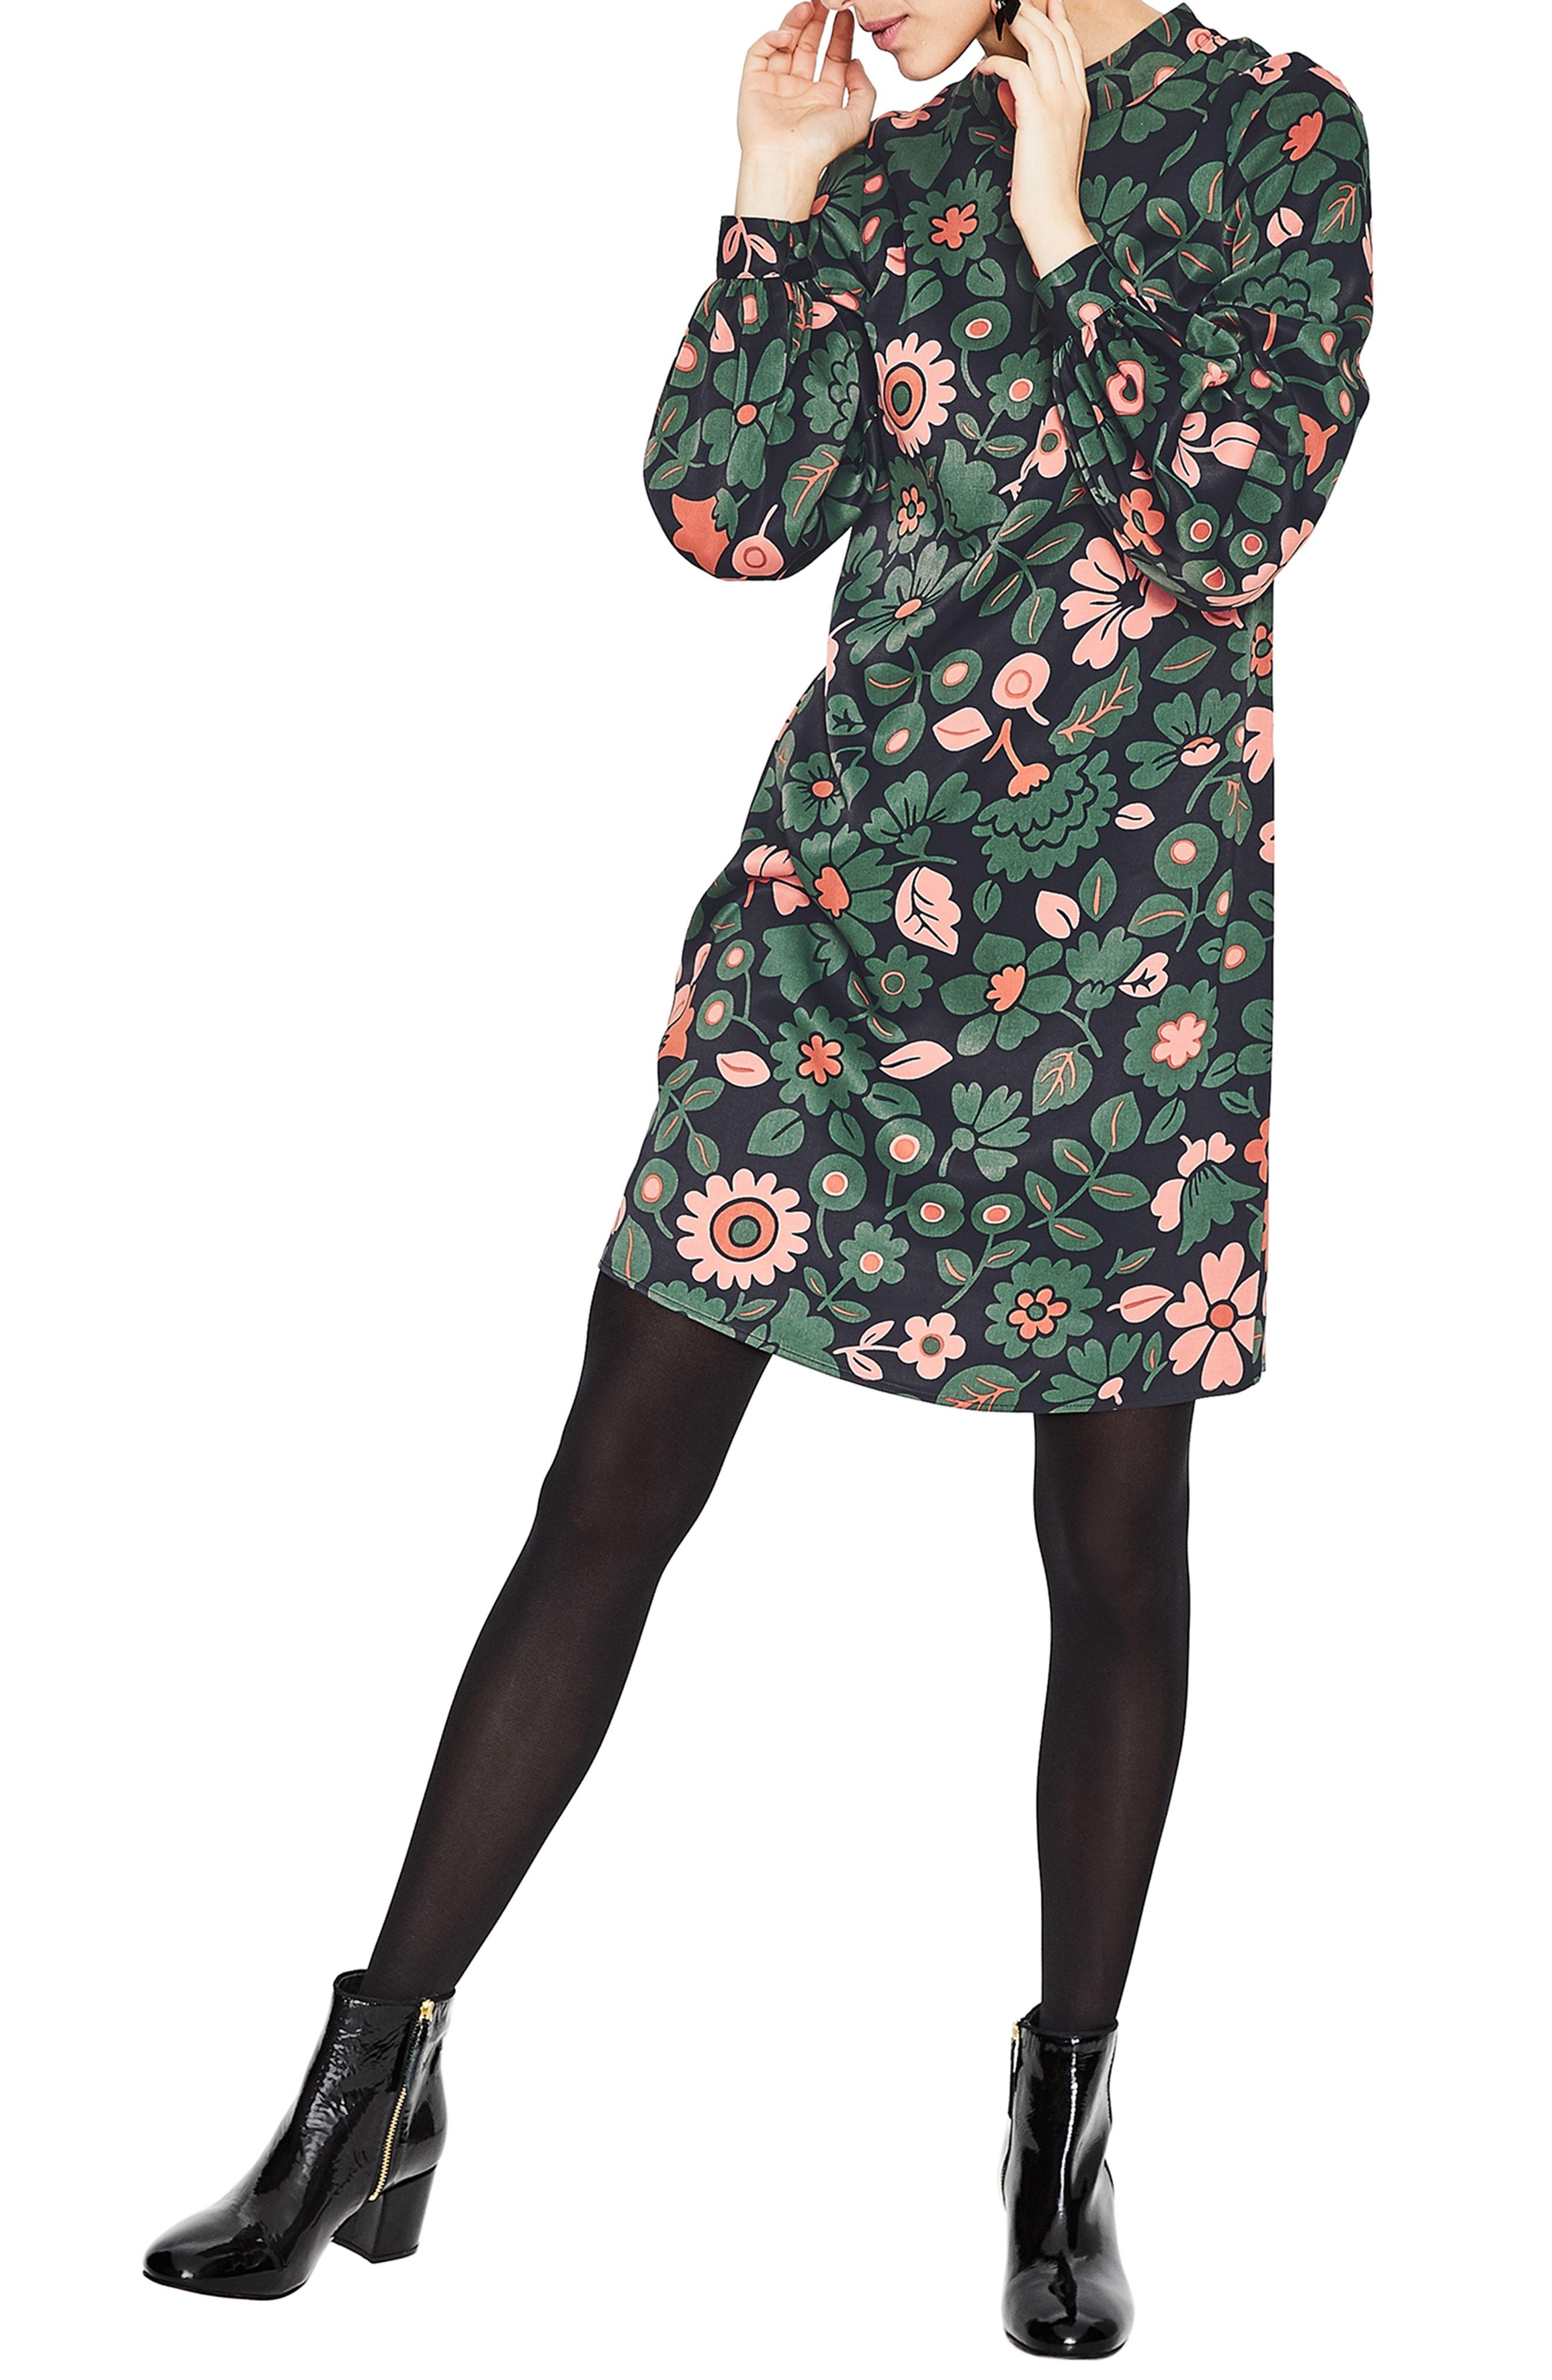 Boden Christobel Floral Shift Dress (Regular & Plus Size)